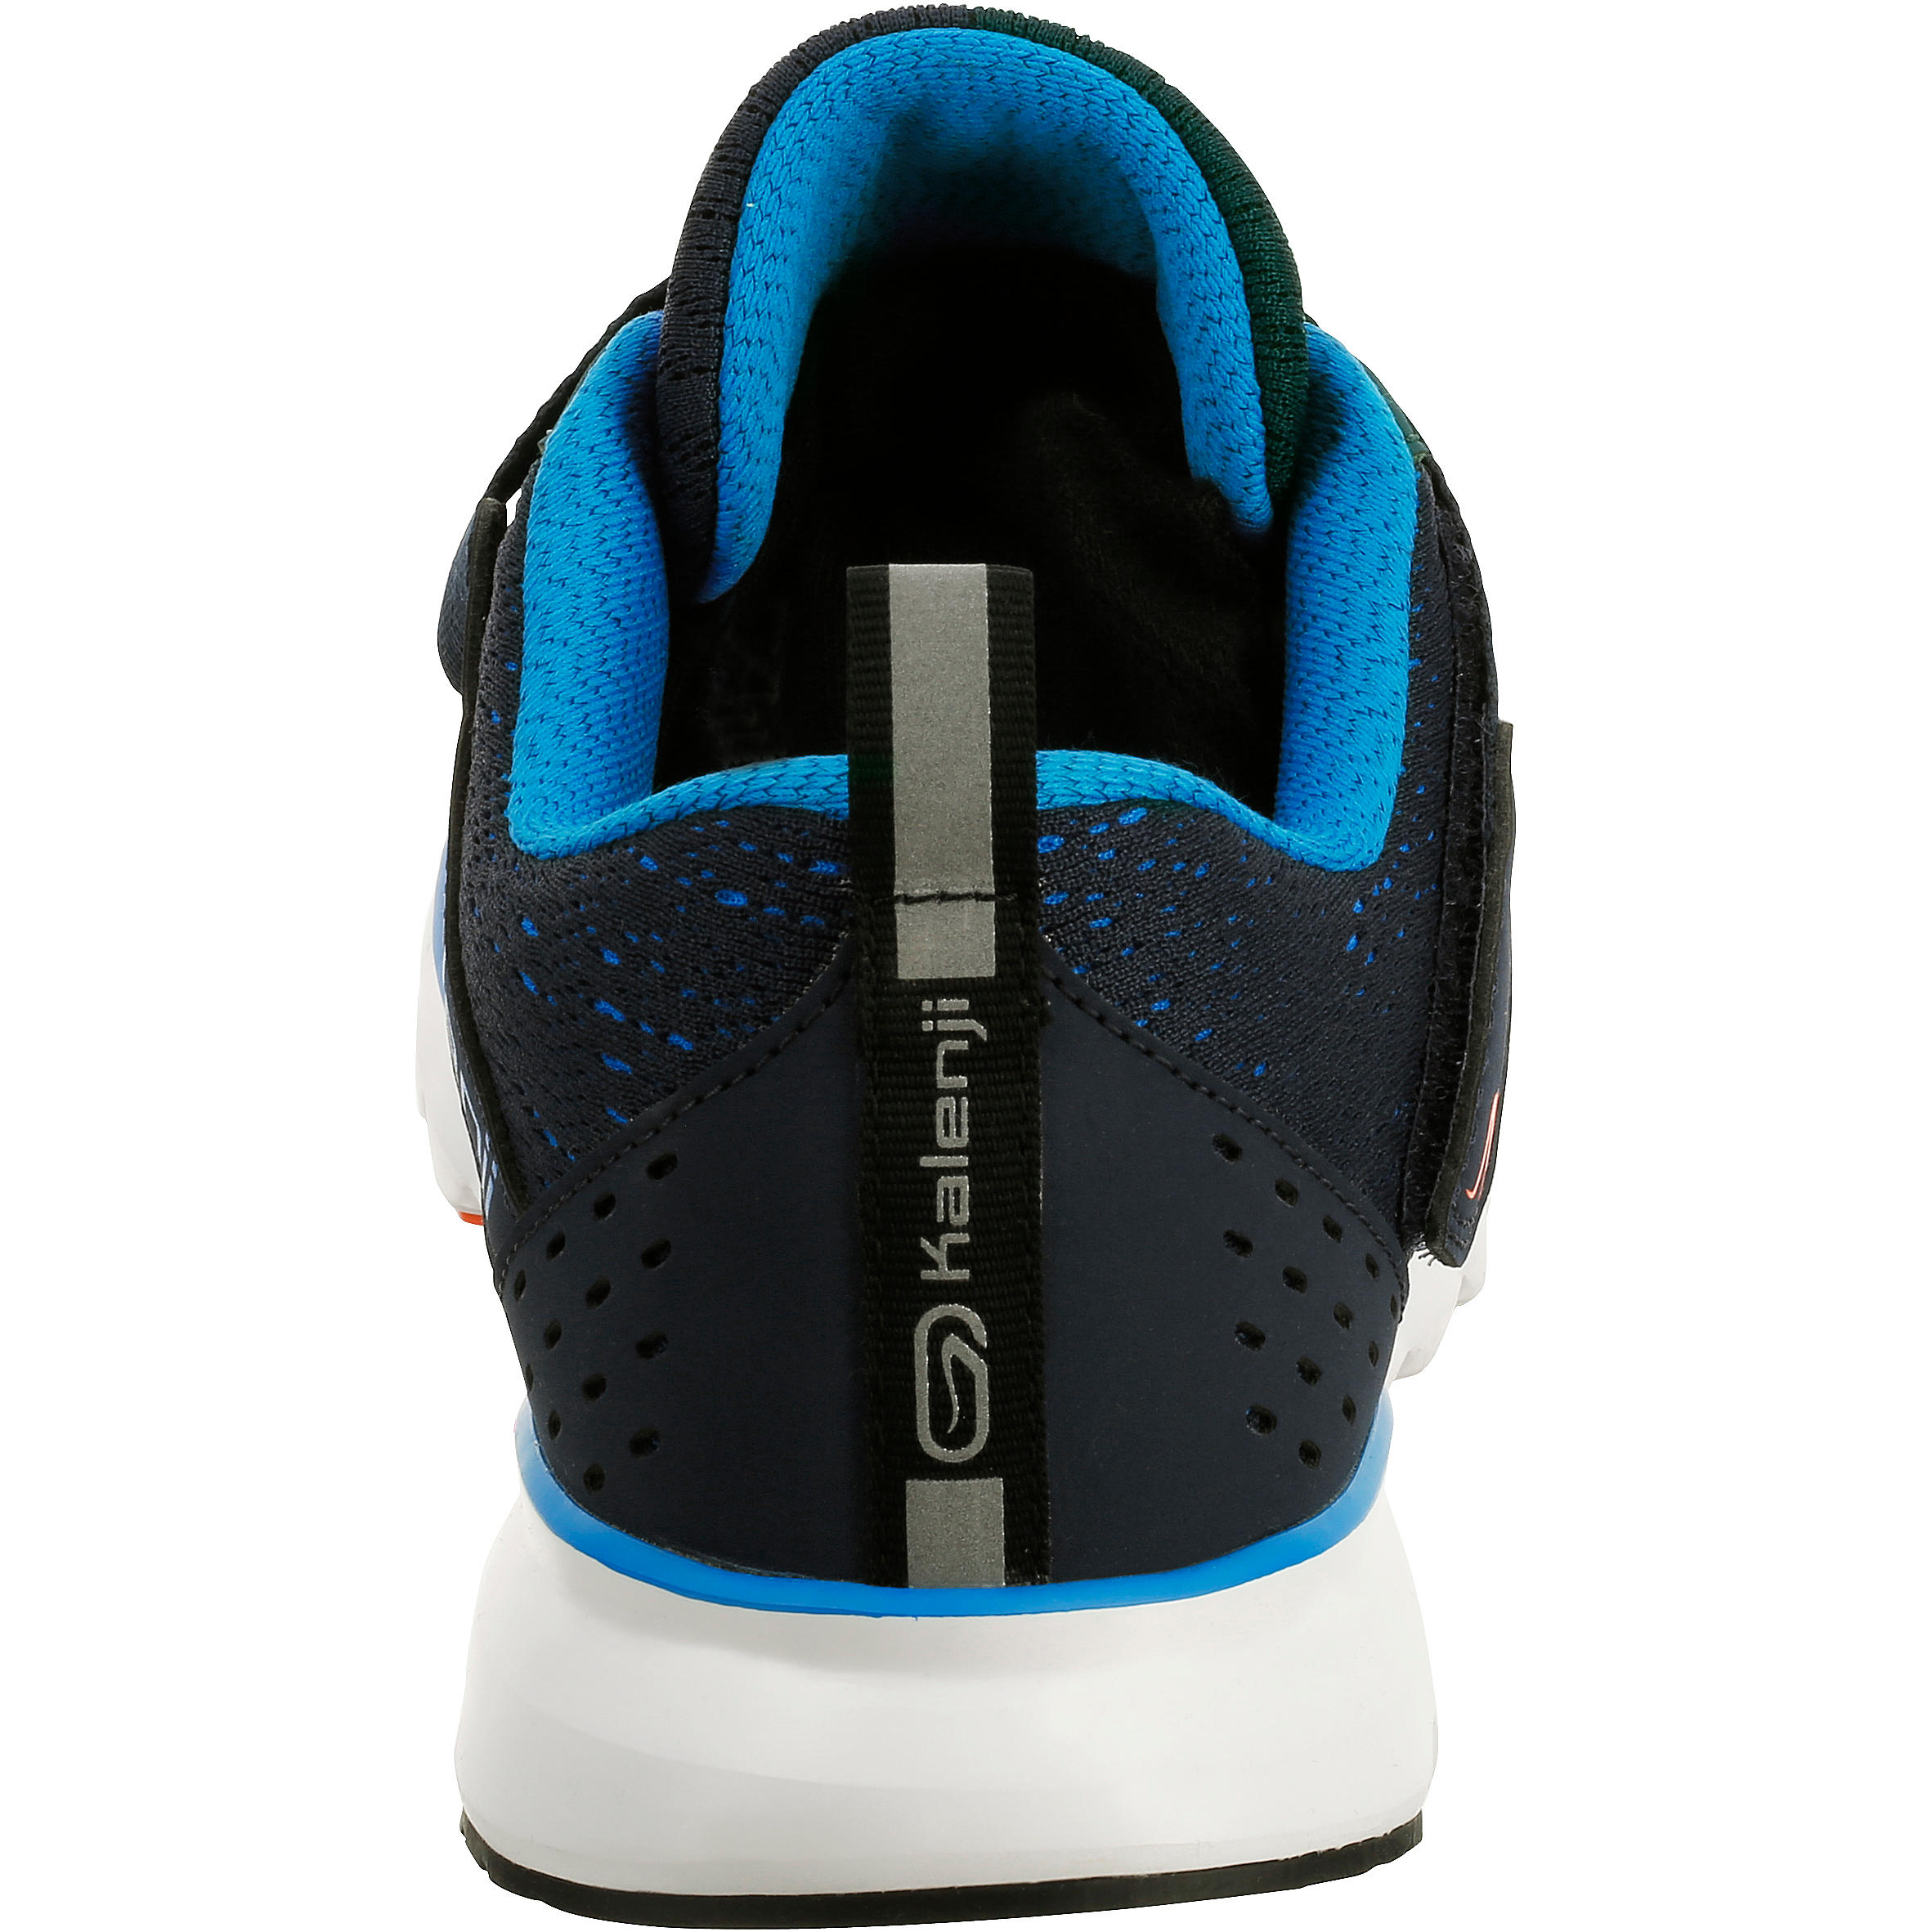 ELIOFEET MEN'S RUNNING SHOES BLUE [RATING: 4.4 ★]